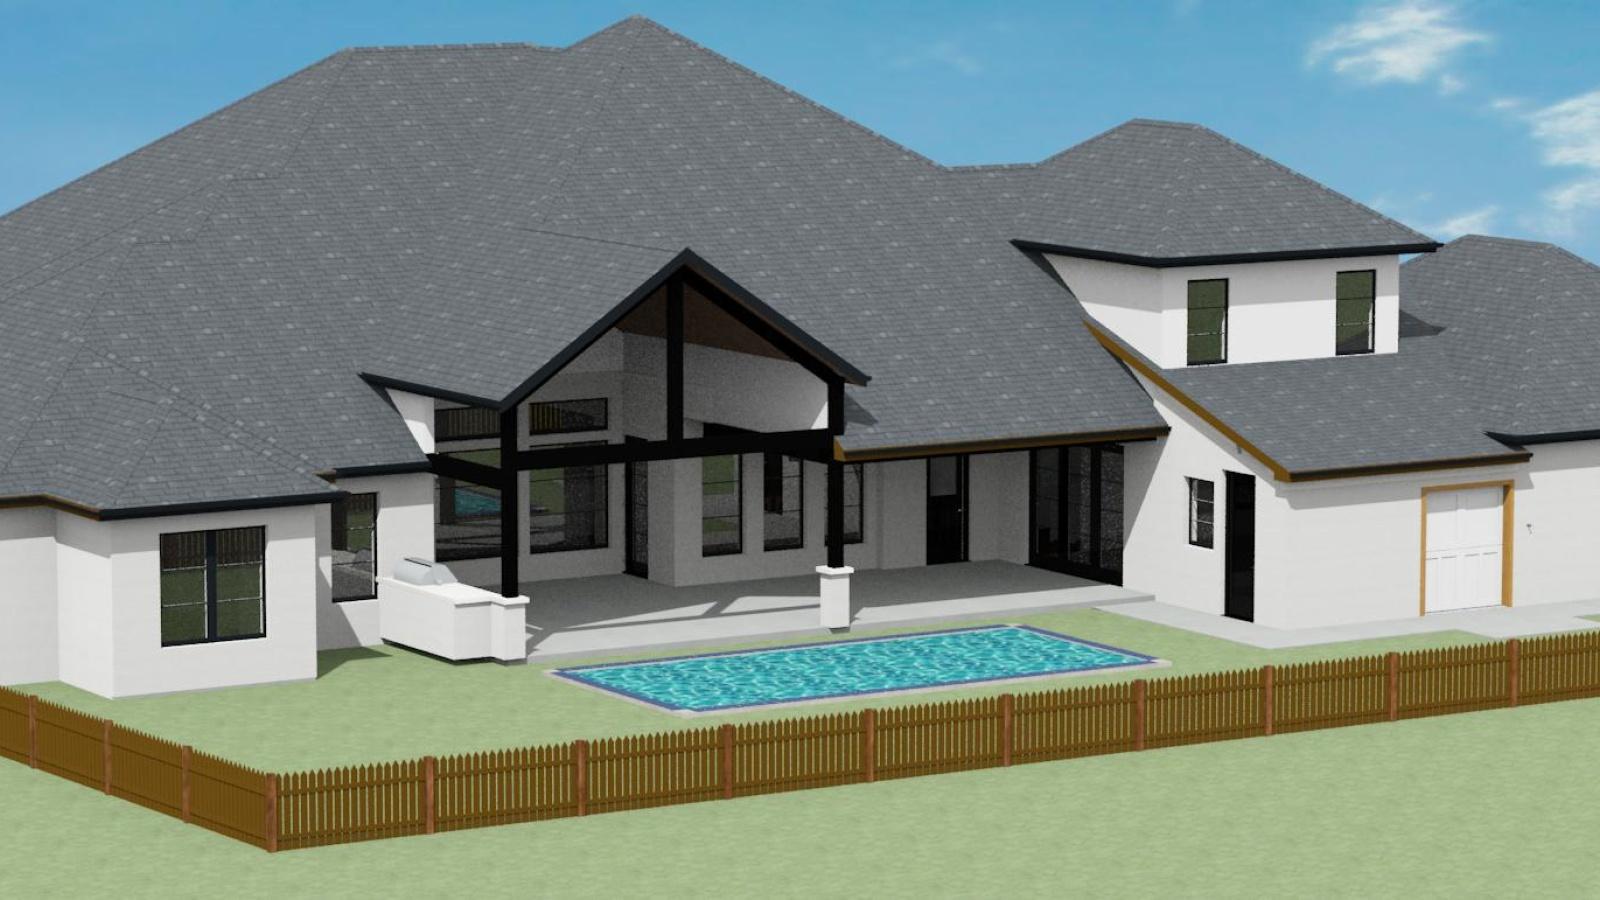 3 Bedrooms Bedrooms, ,5 BathroomsBathrooms,Custom Home,Home Plans,1050